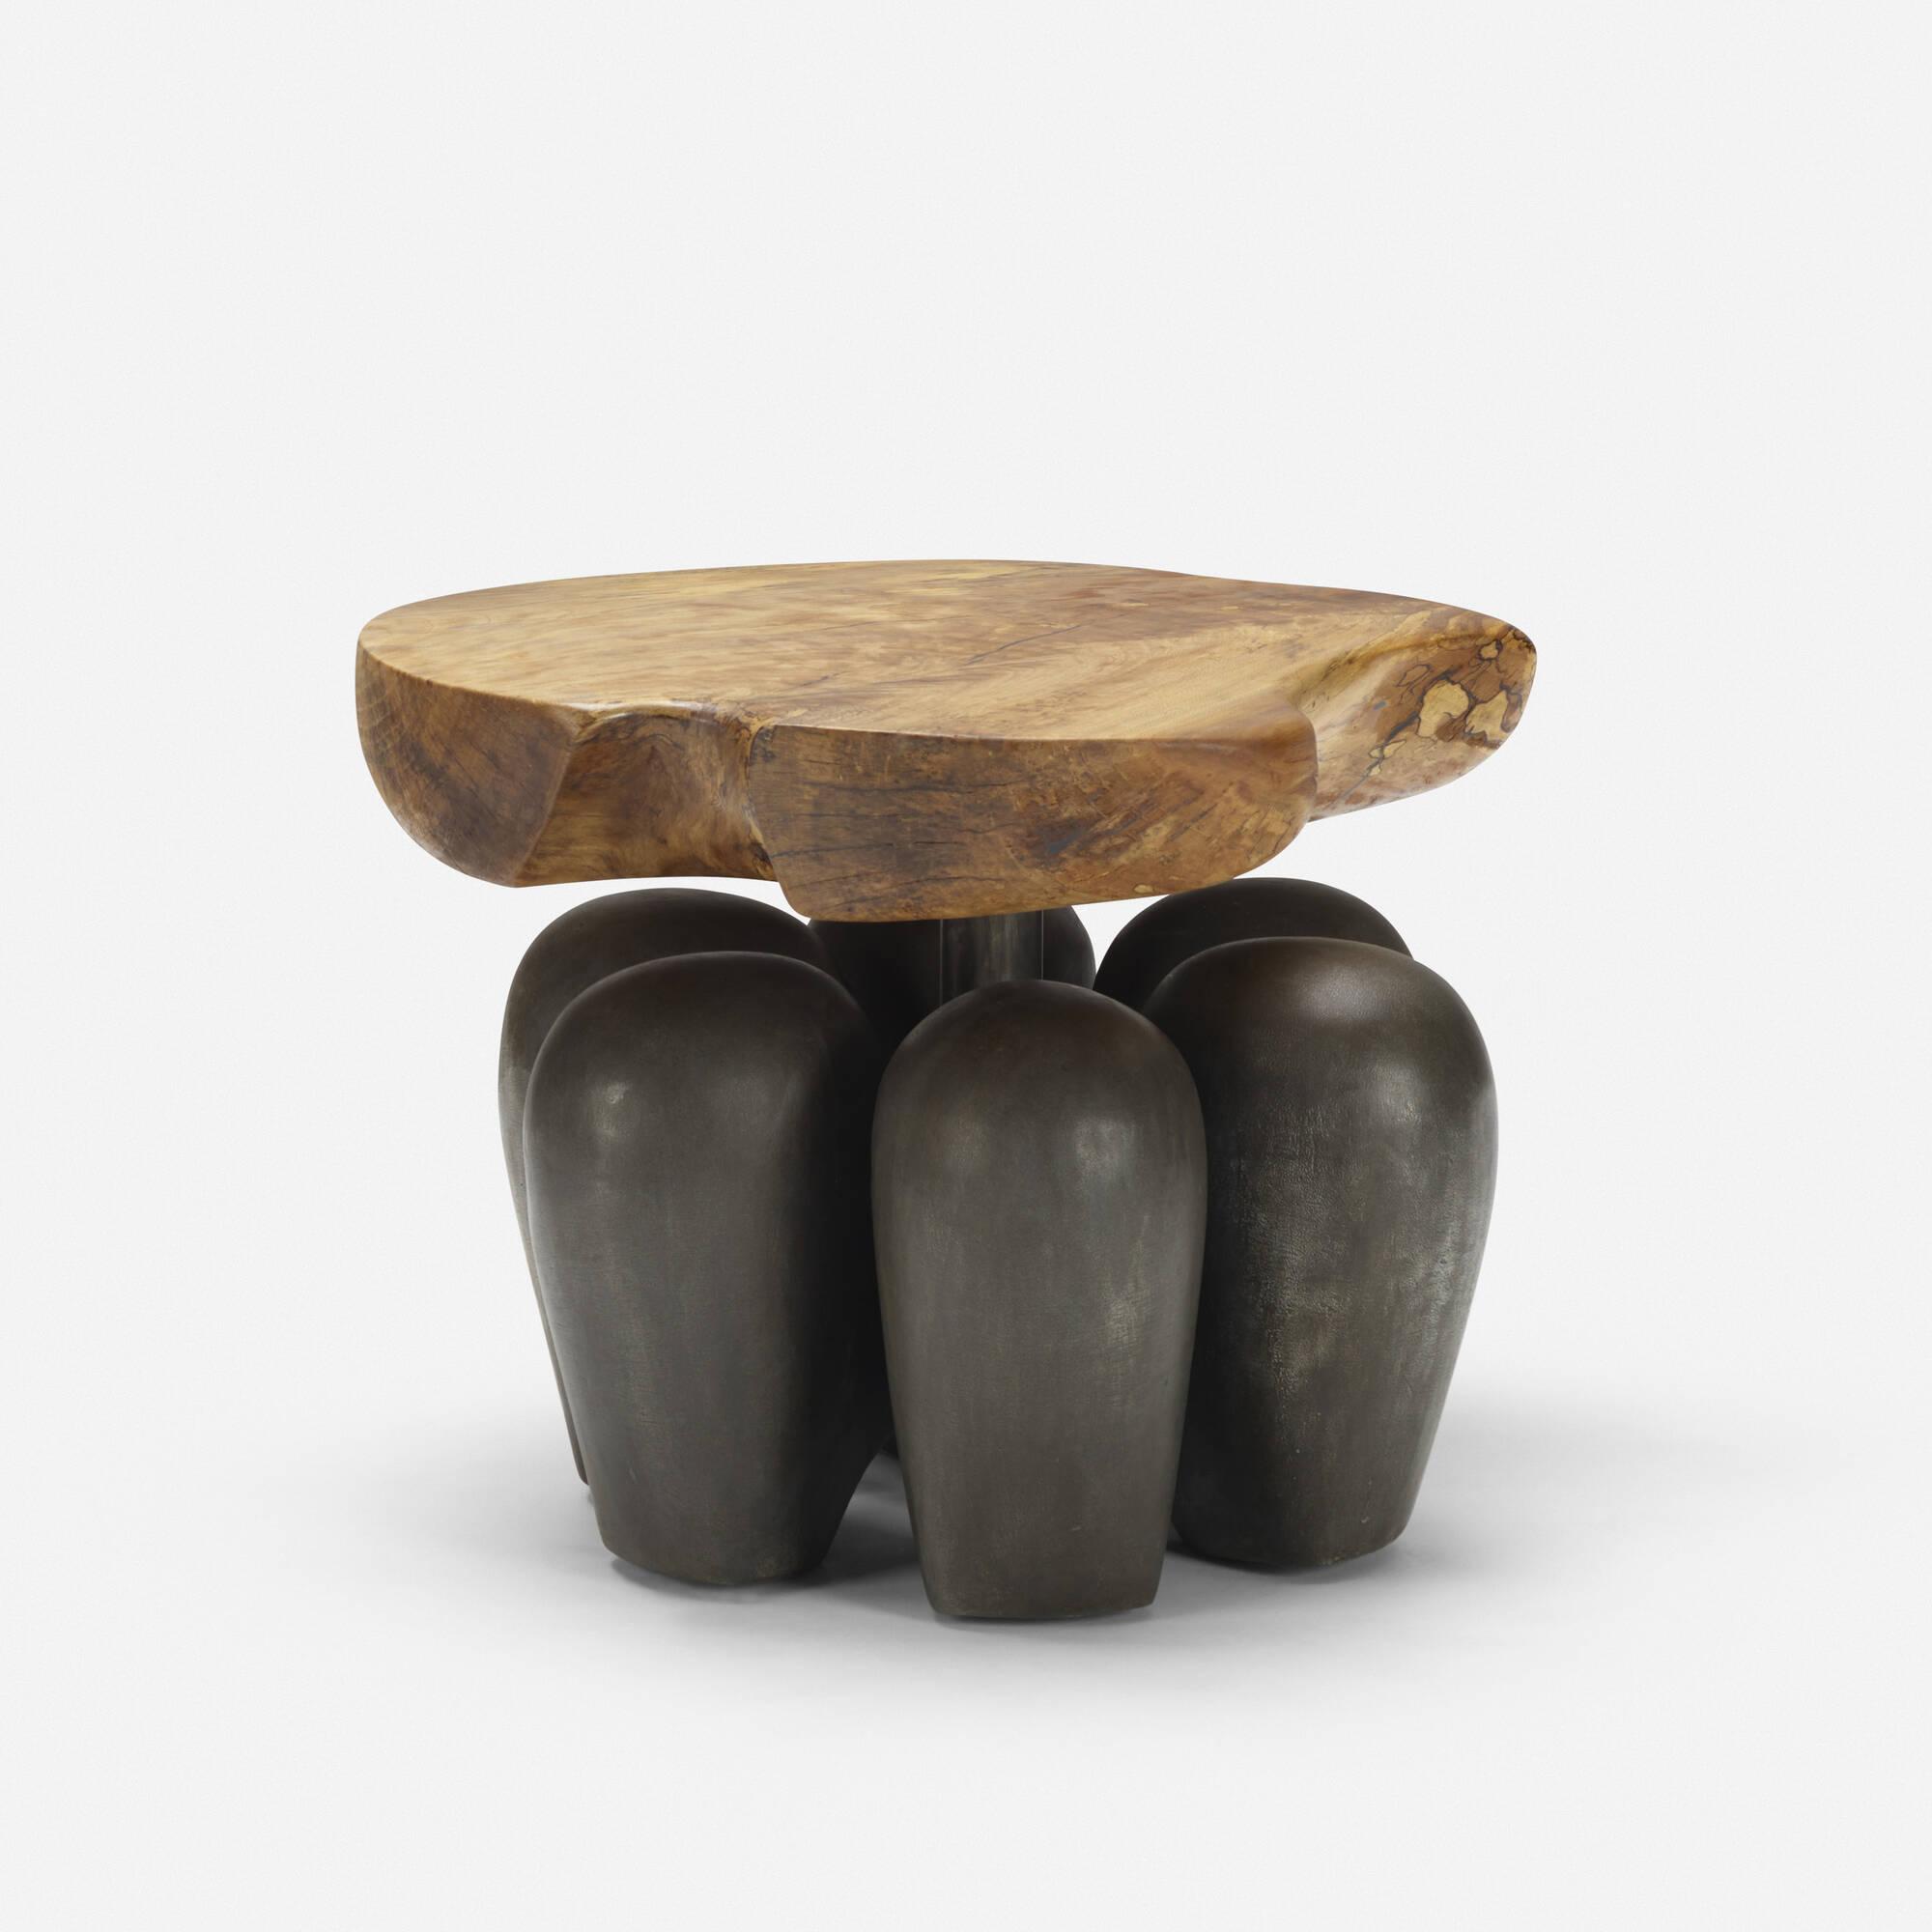 196: Jordan Mozer / prototype Truffala occasional table (2 of 2)